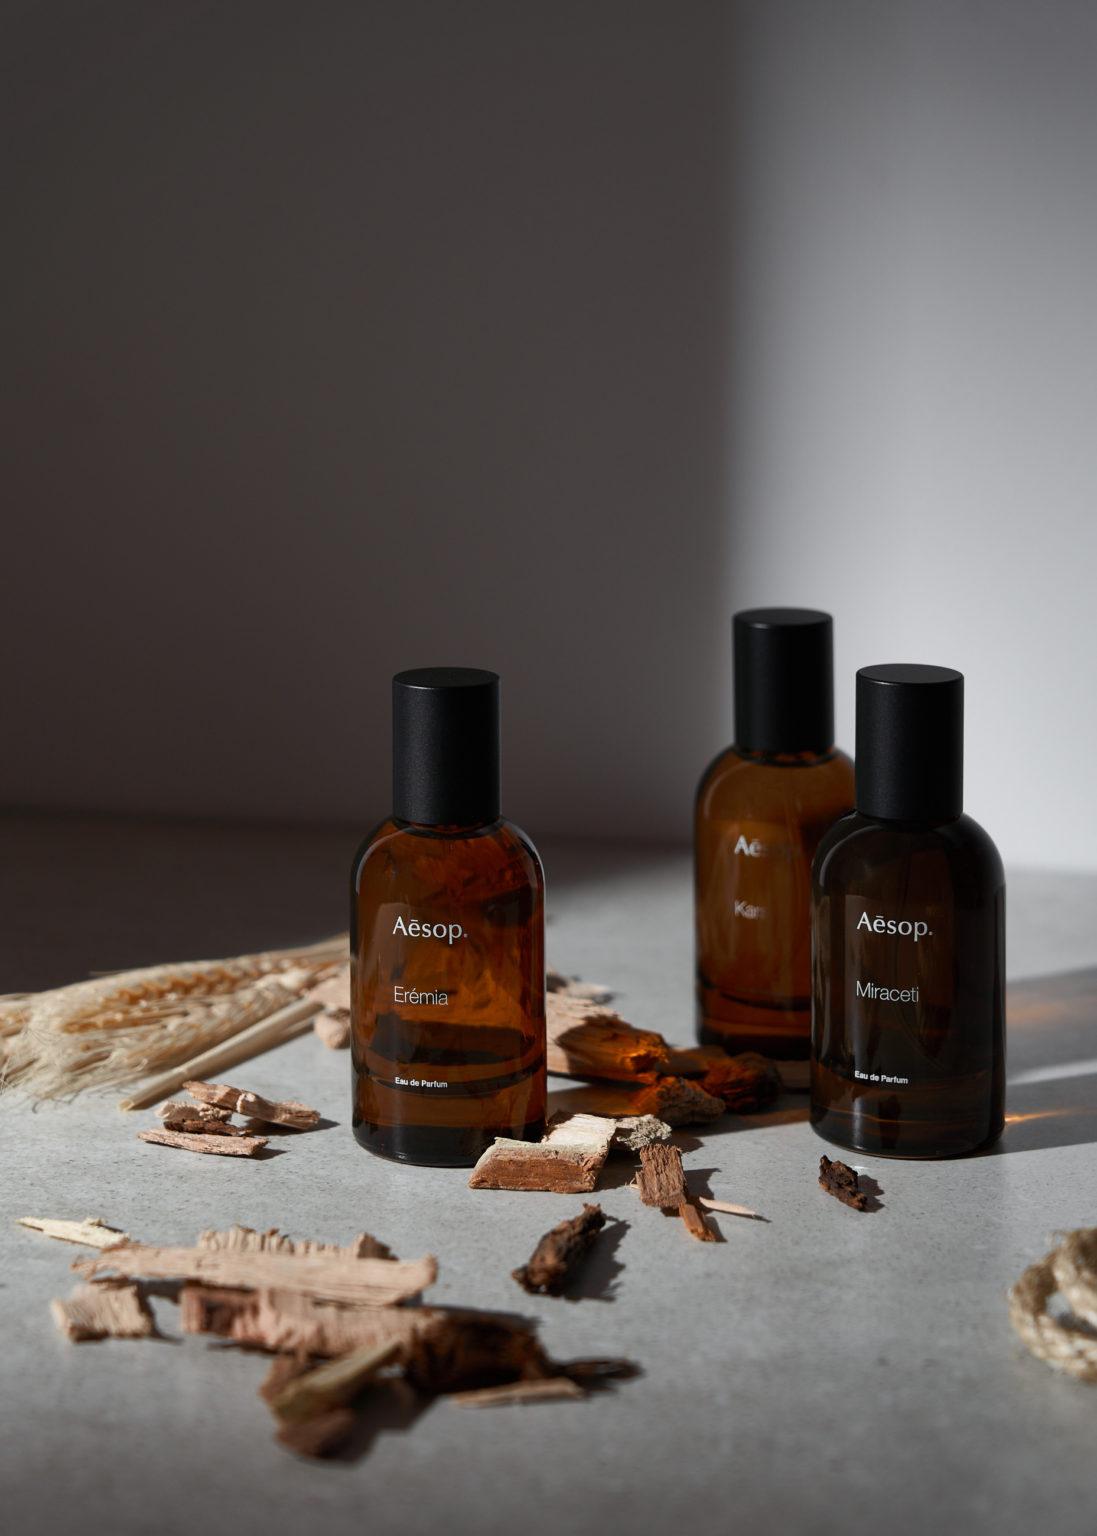 New Aesop Fragrances